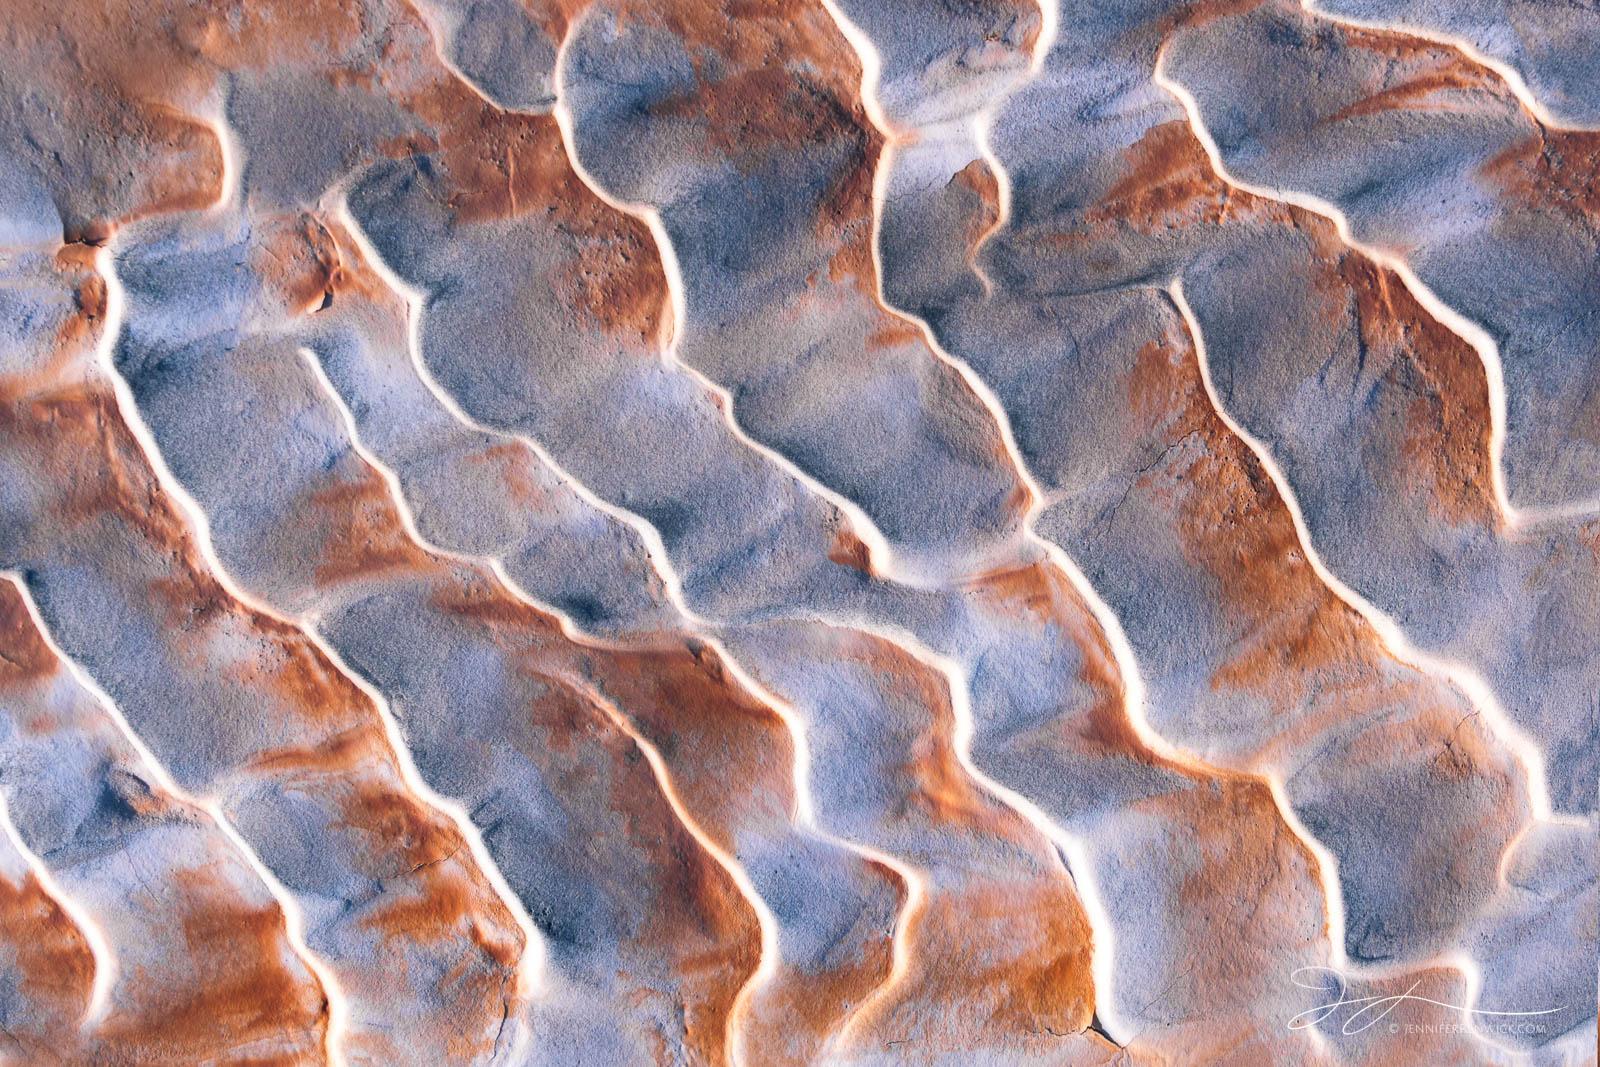 Sand ripples create a textured surface on the desert floor.